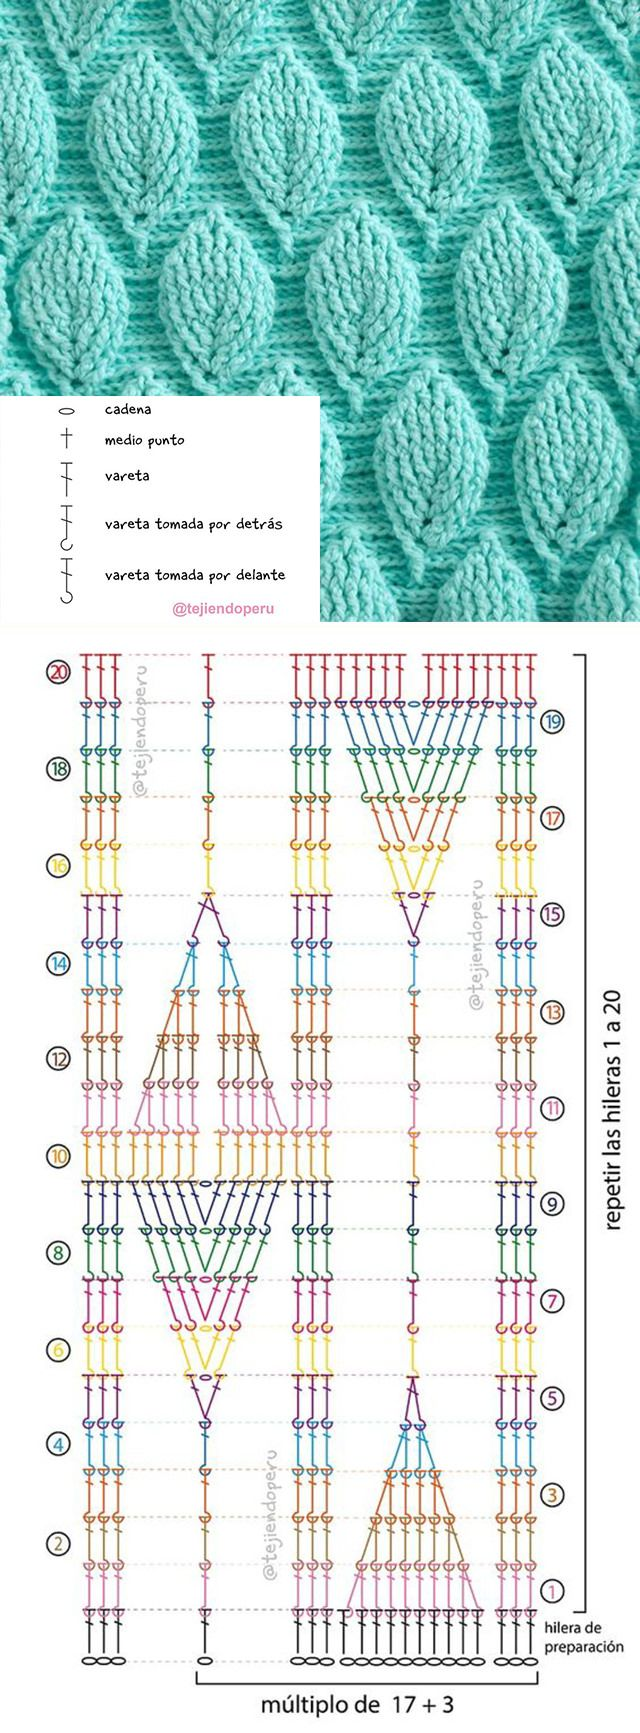 Leaf stitch crochet pattern tutorial crochet pinterest pontos leaf stitch crochet pattern tutorial crochet pinterest pontos de croch pontes e croch ccuart Images